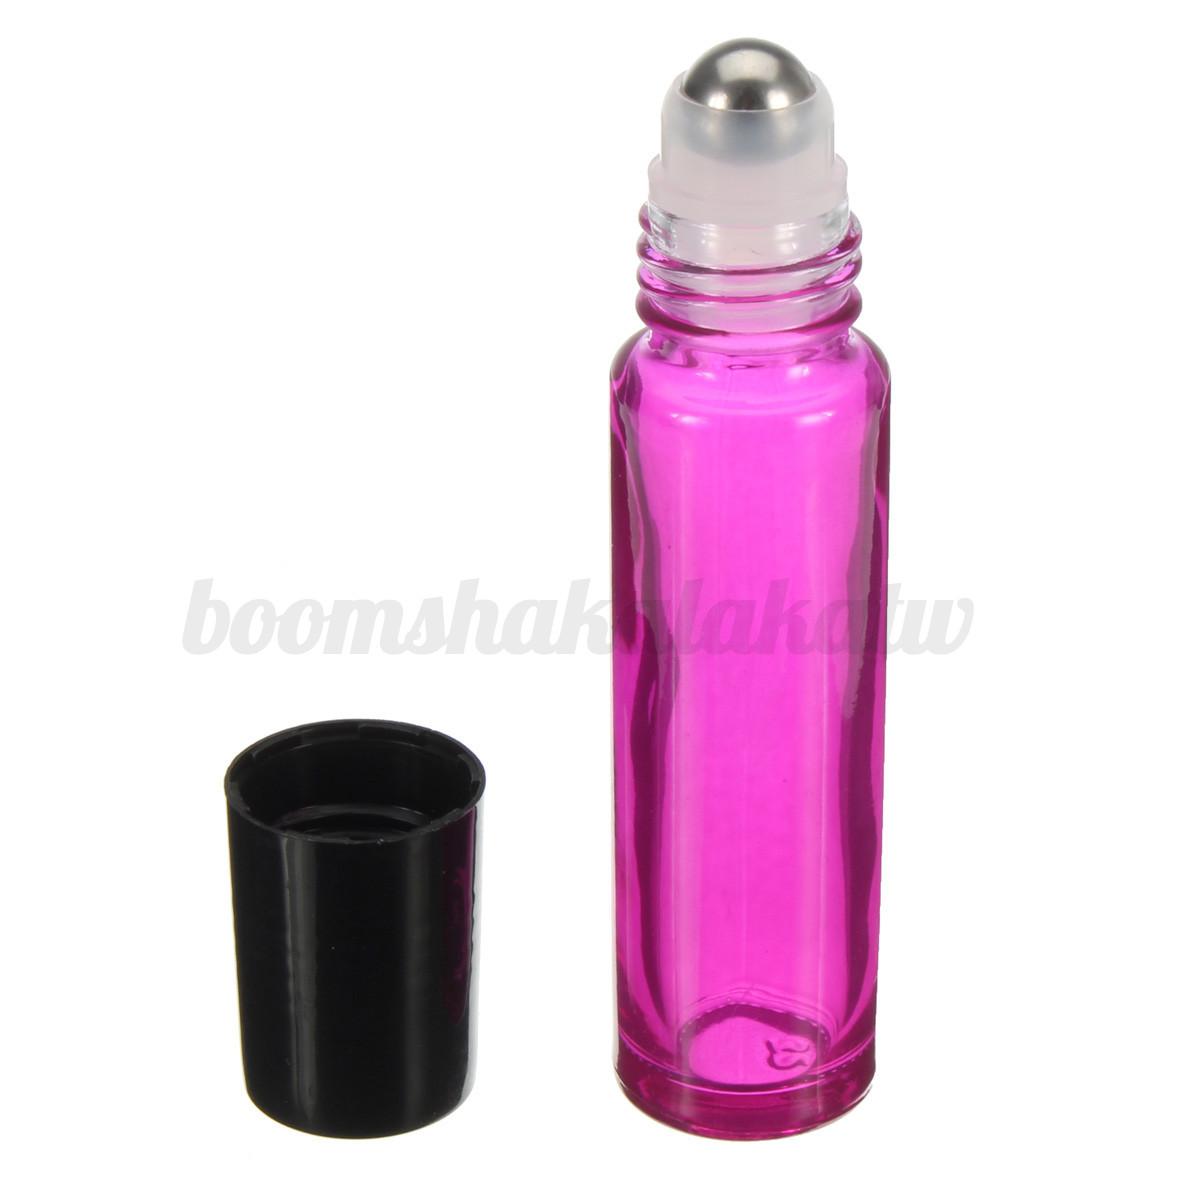 Ml Aromatherapy Glass Roller Bottles Australia